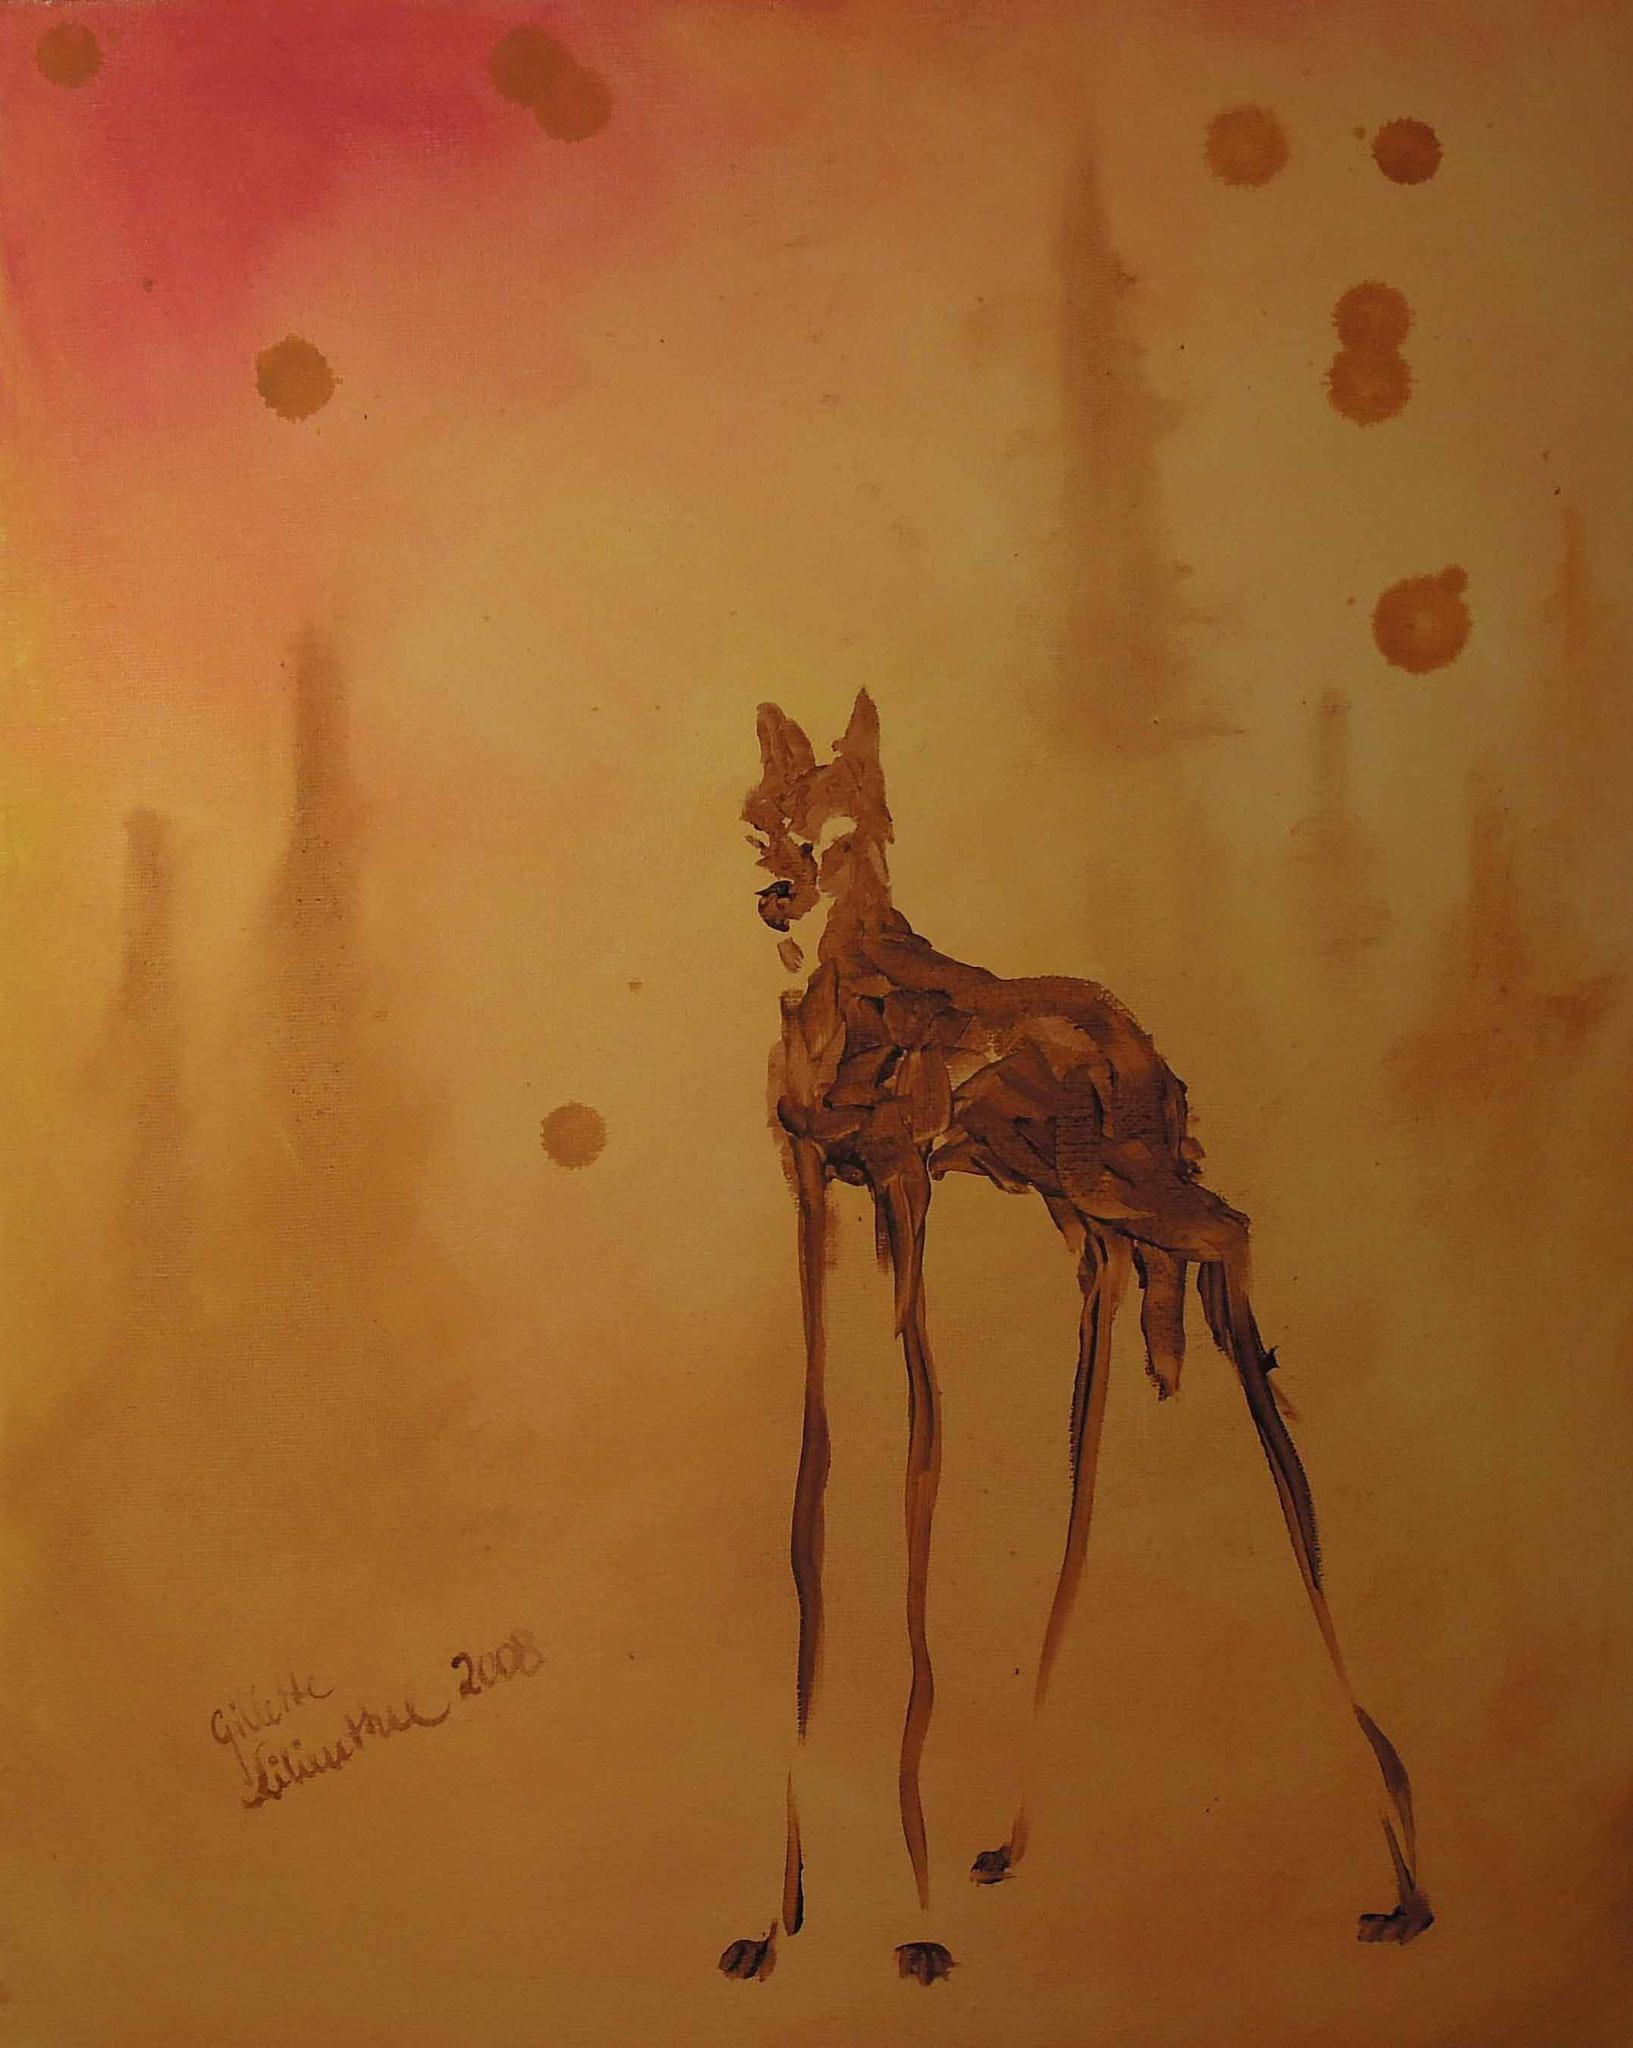 Wolf - Öl auf Leinwand 40 x 50 cm